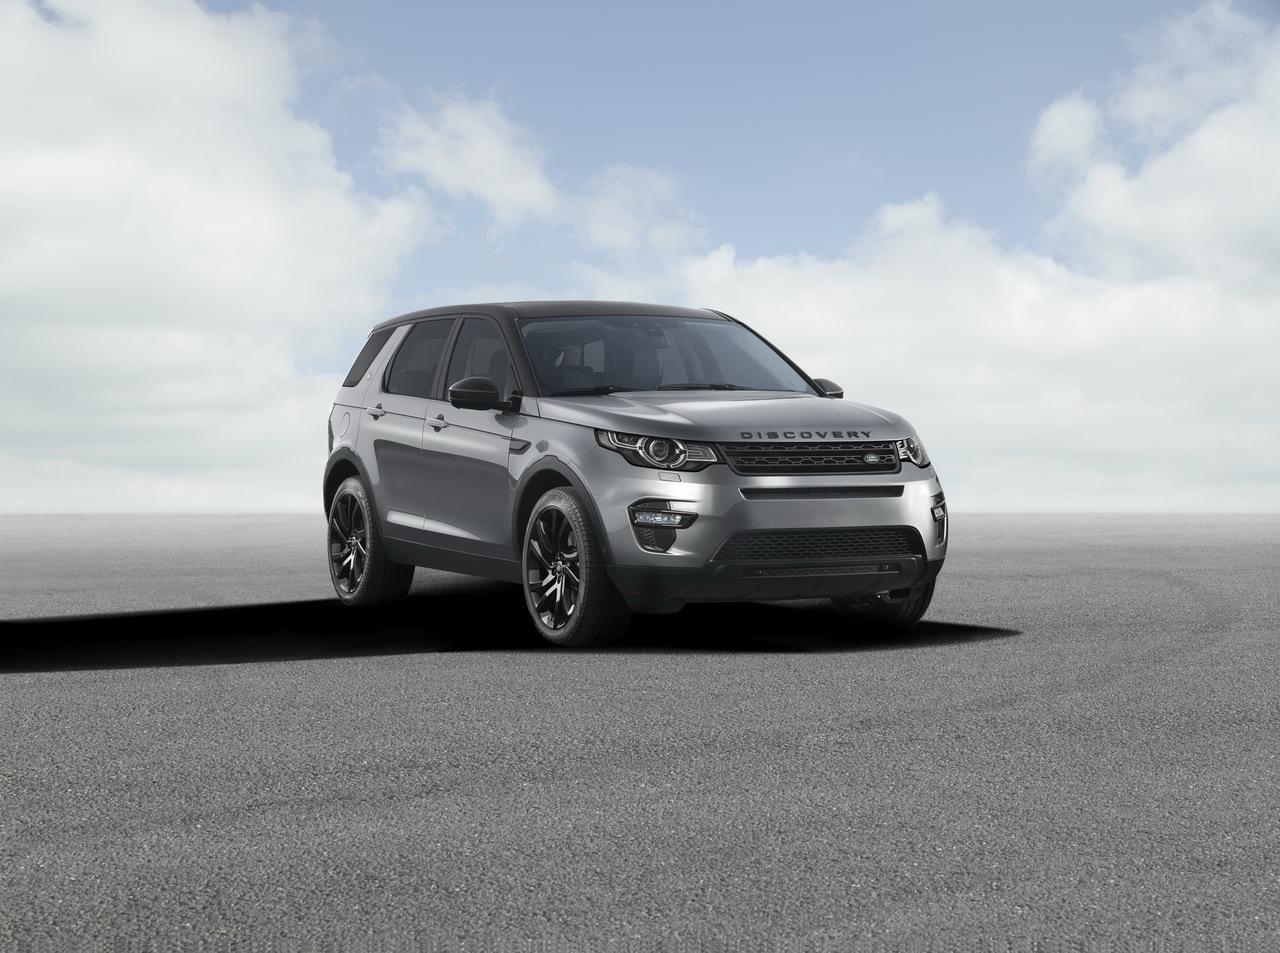 land rover discovery sport 2014 prix gamme et quipements l 39 argus. Black Bedroom Furniture Sets. Home Design Ideas